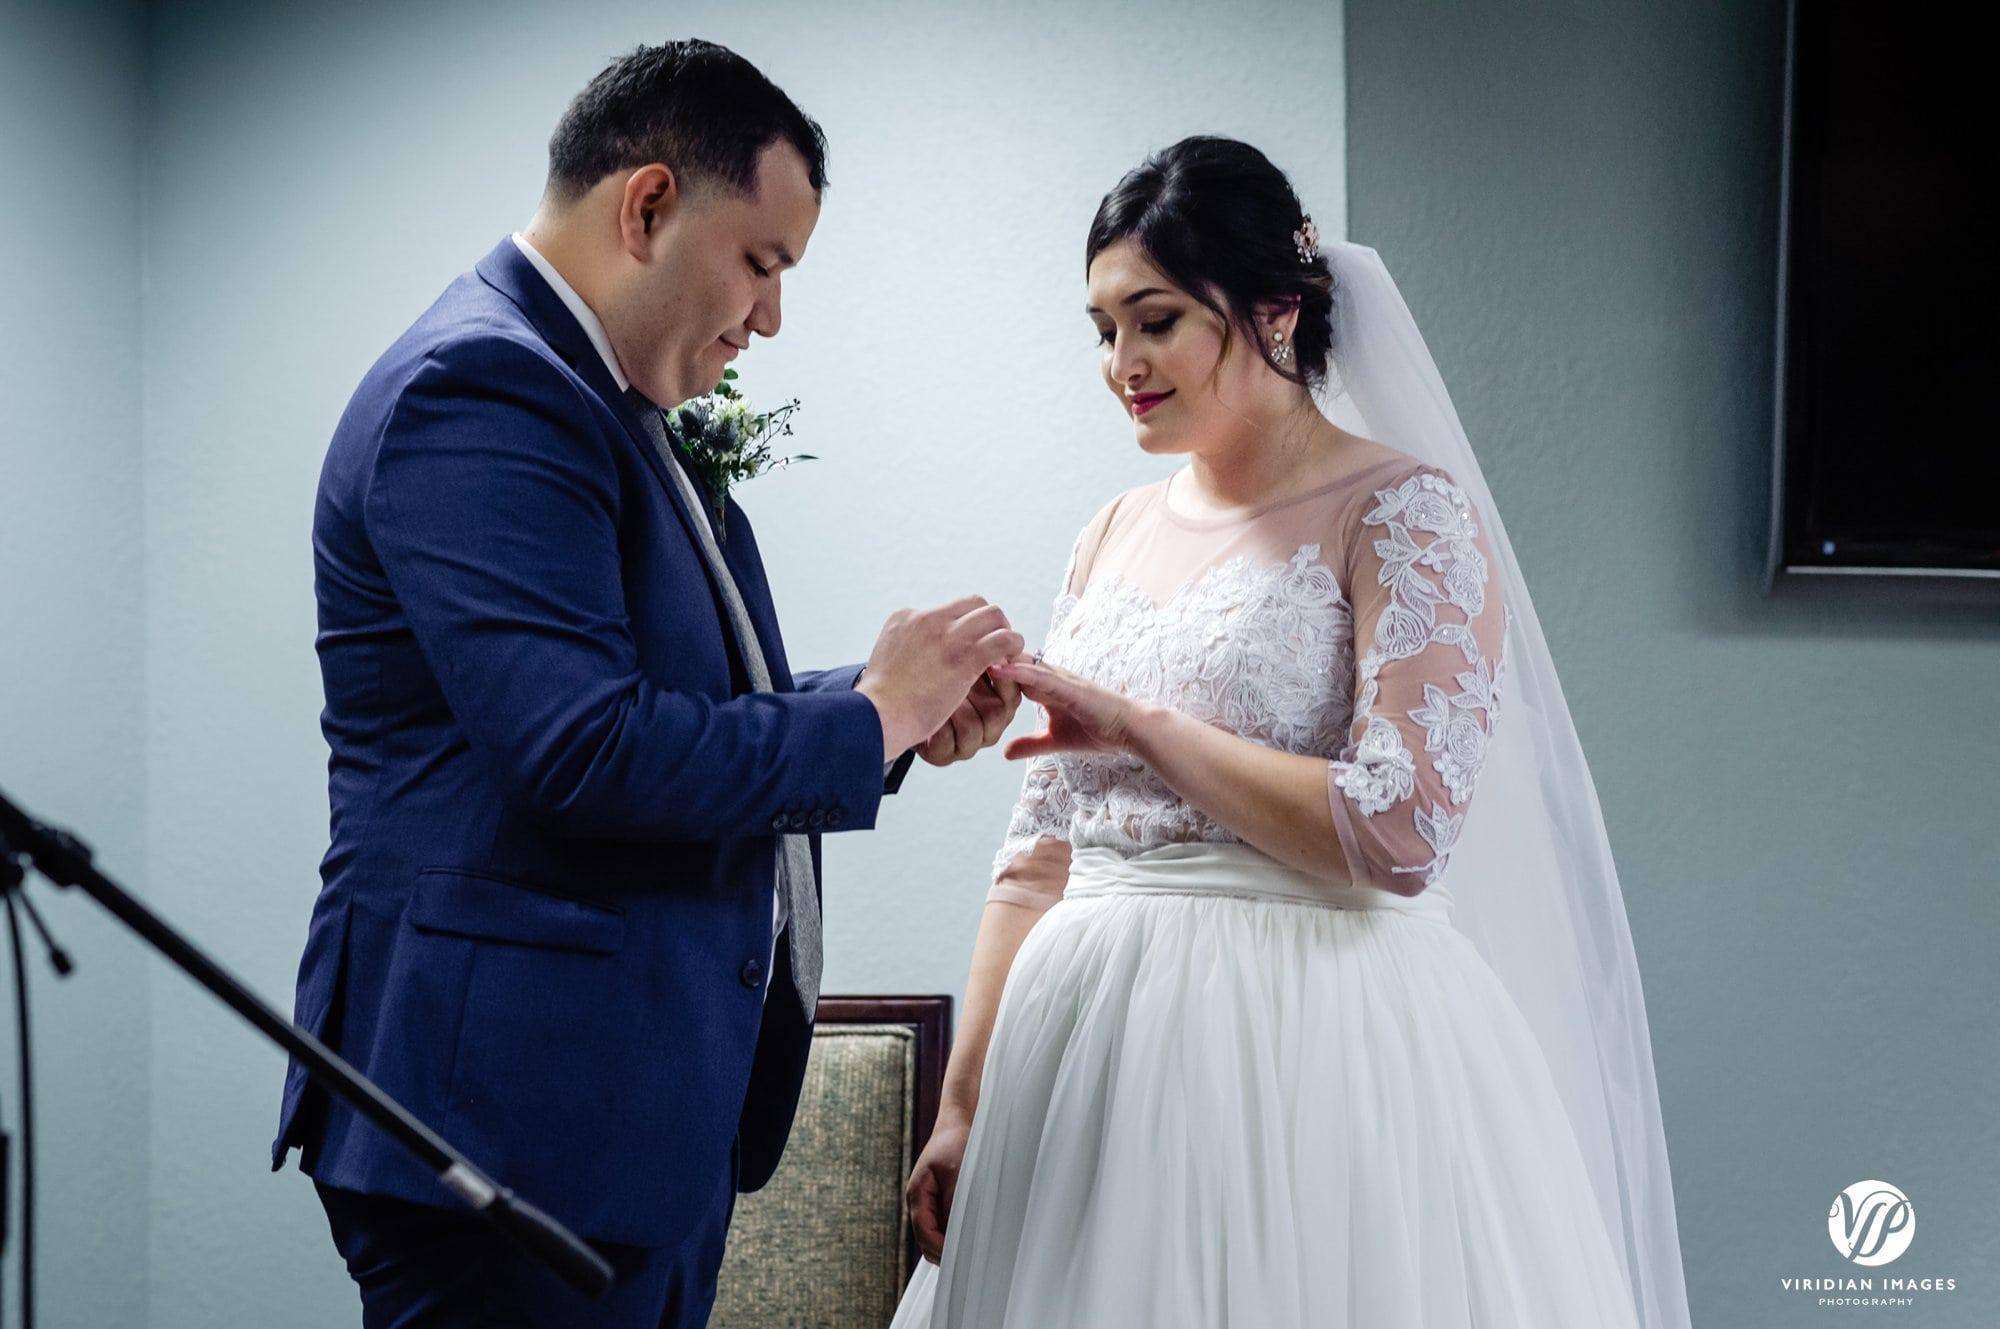 Kingdom Hall wedding ring exchange